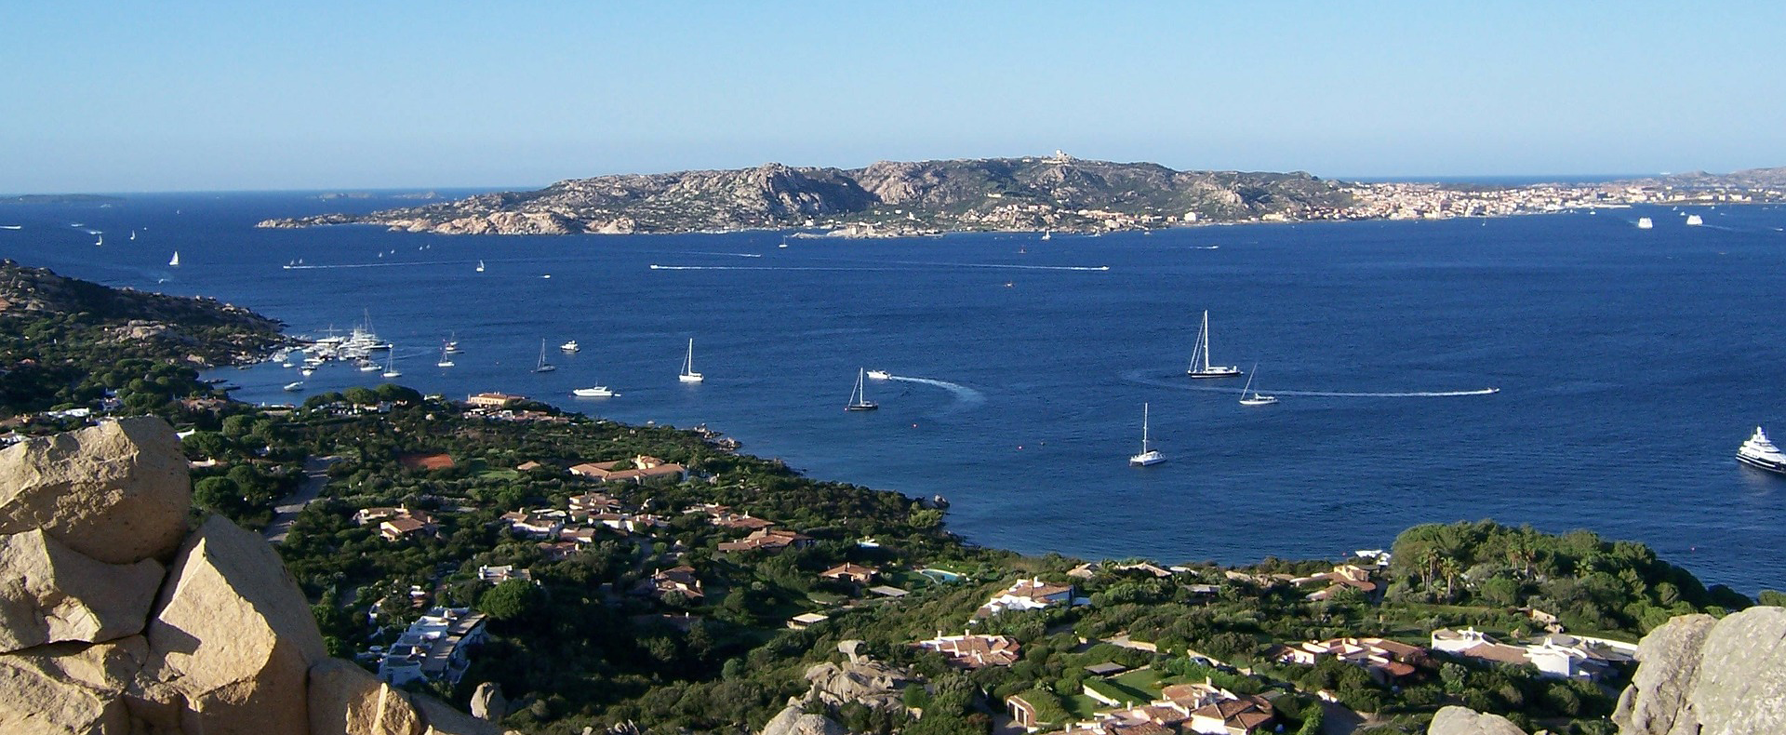 Vakantie in Italië: La Maddalena